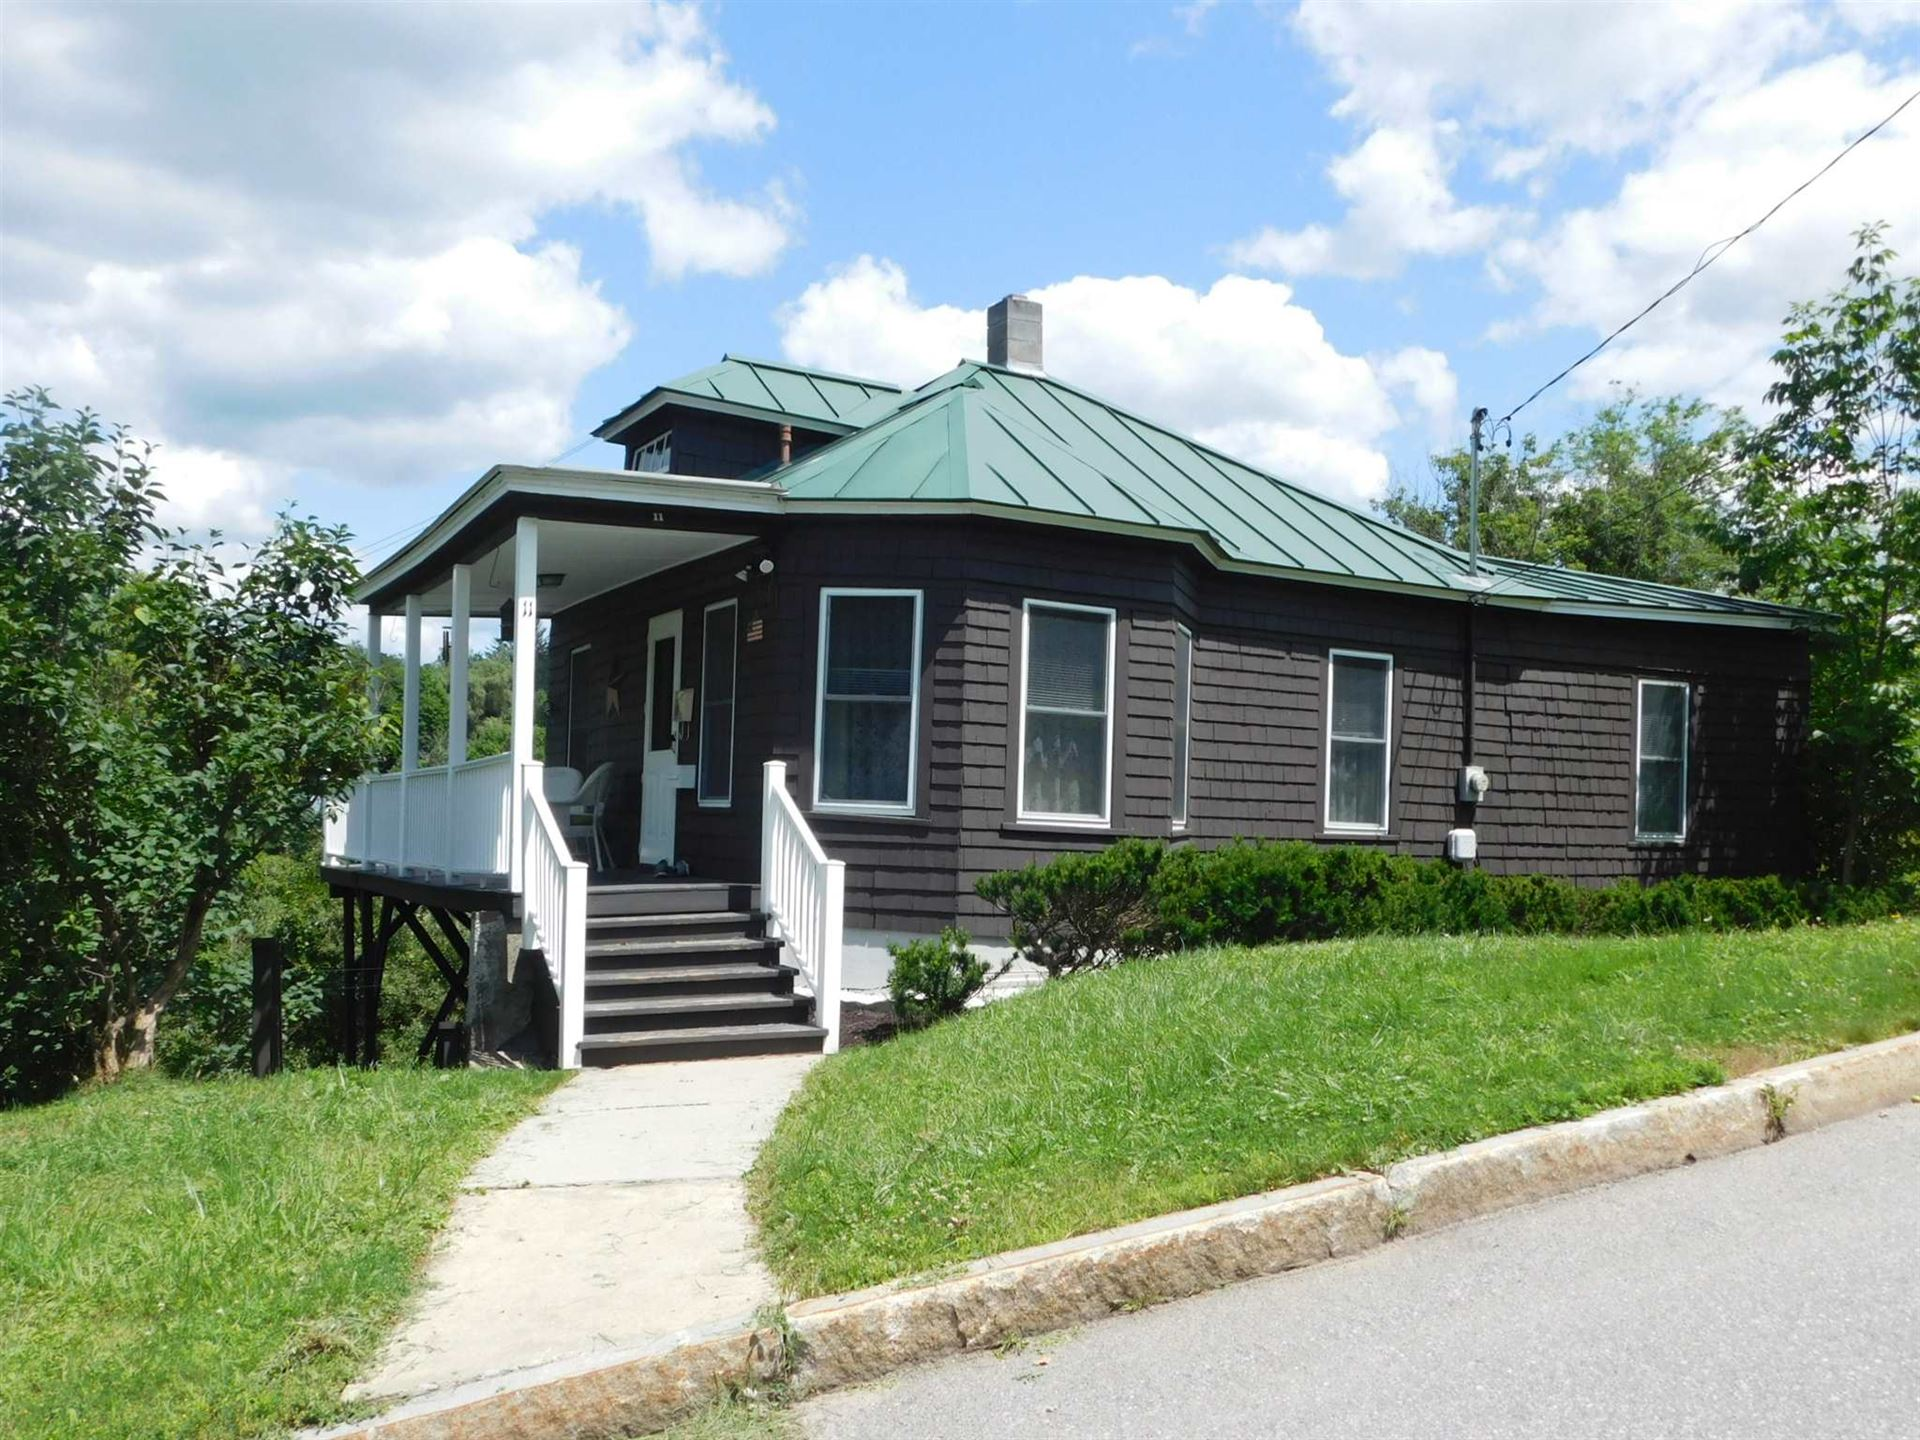 11 Ridge Street, Montpelier, VT 05602 - MLS#: 4804703